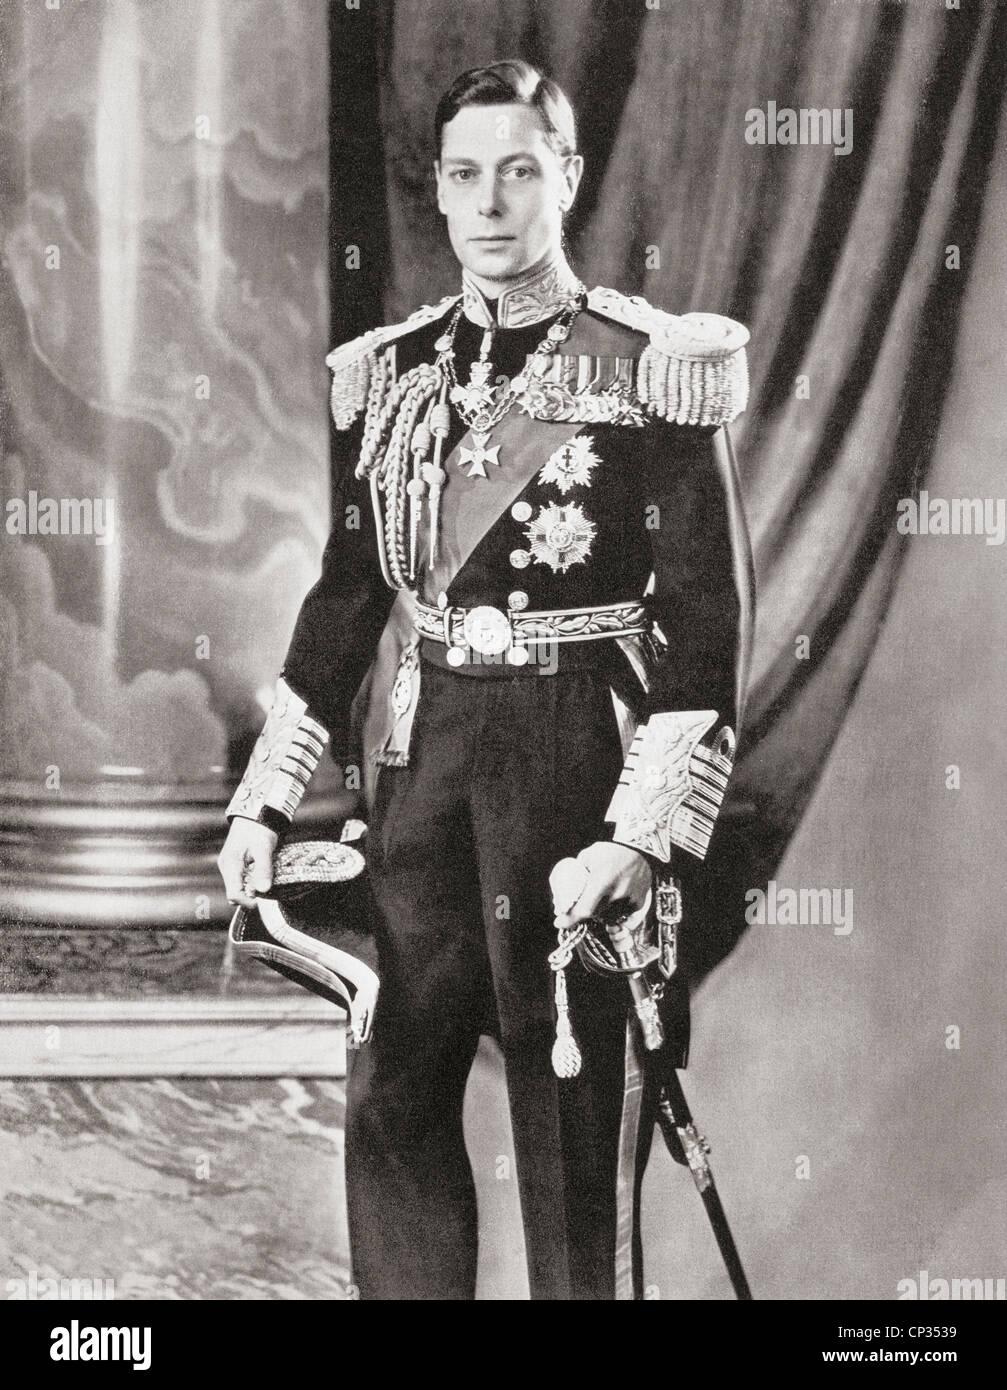 George VI, 1895 – 1952. King of the United Kingdom. - Stock Image